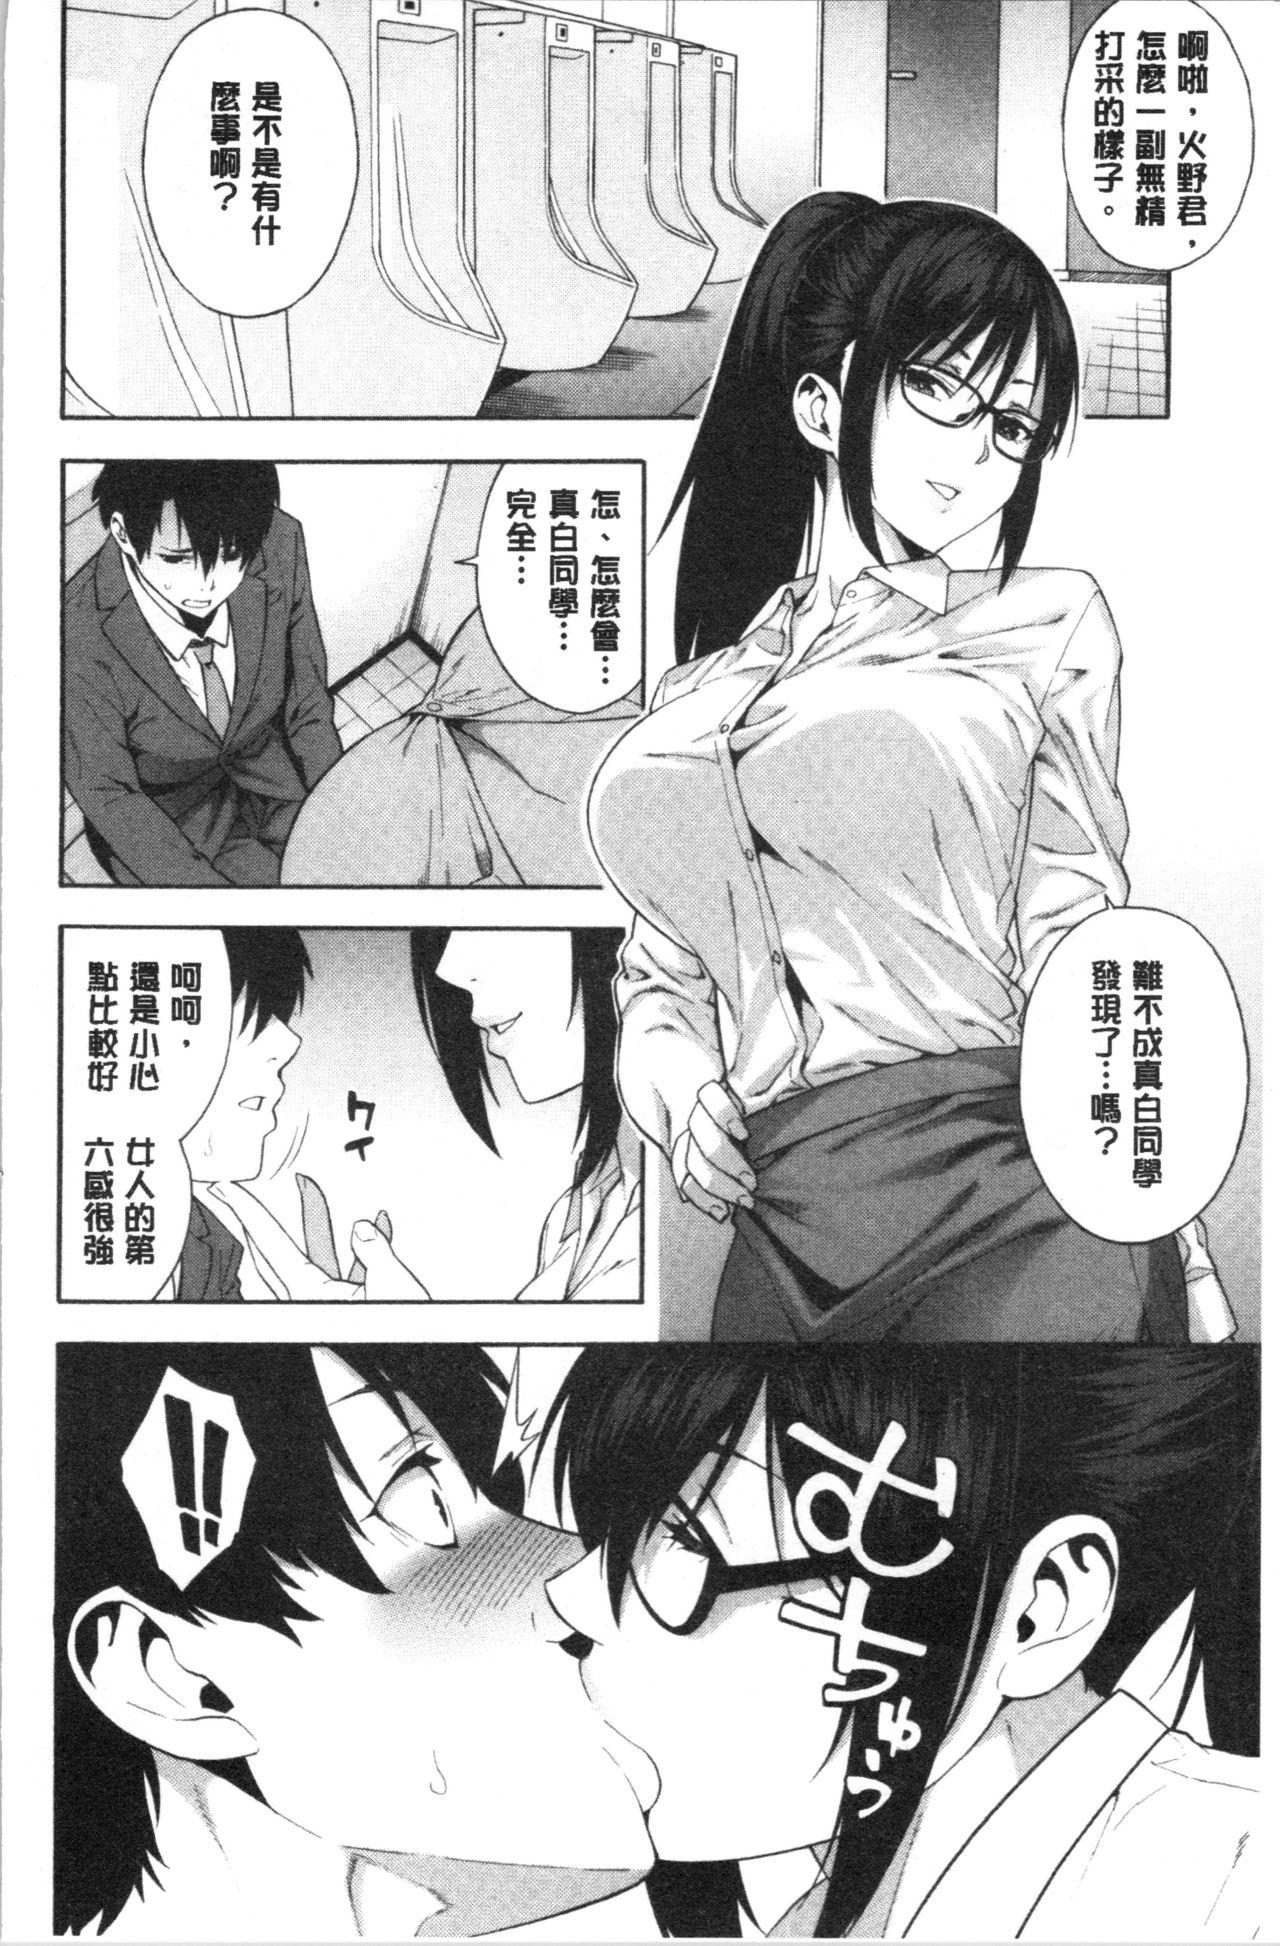 Okashite Ageru | 讓你來侵犯我 58